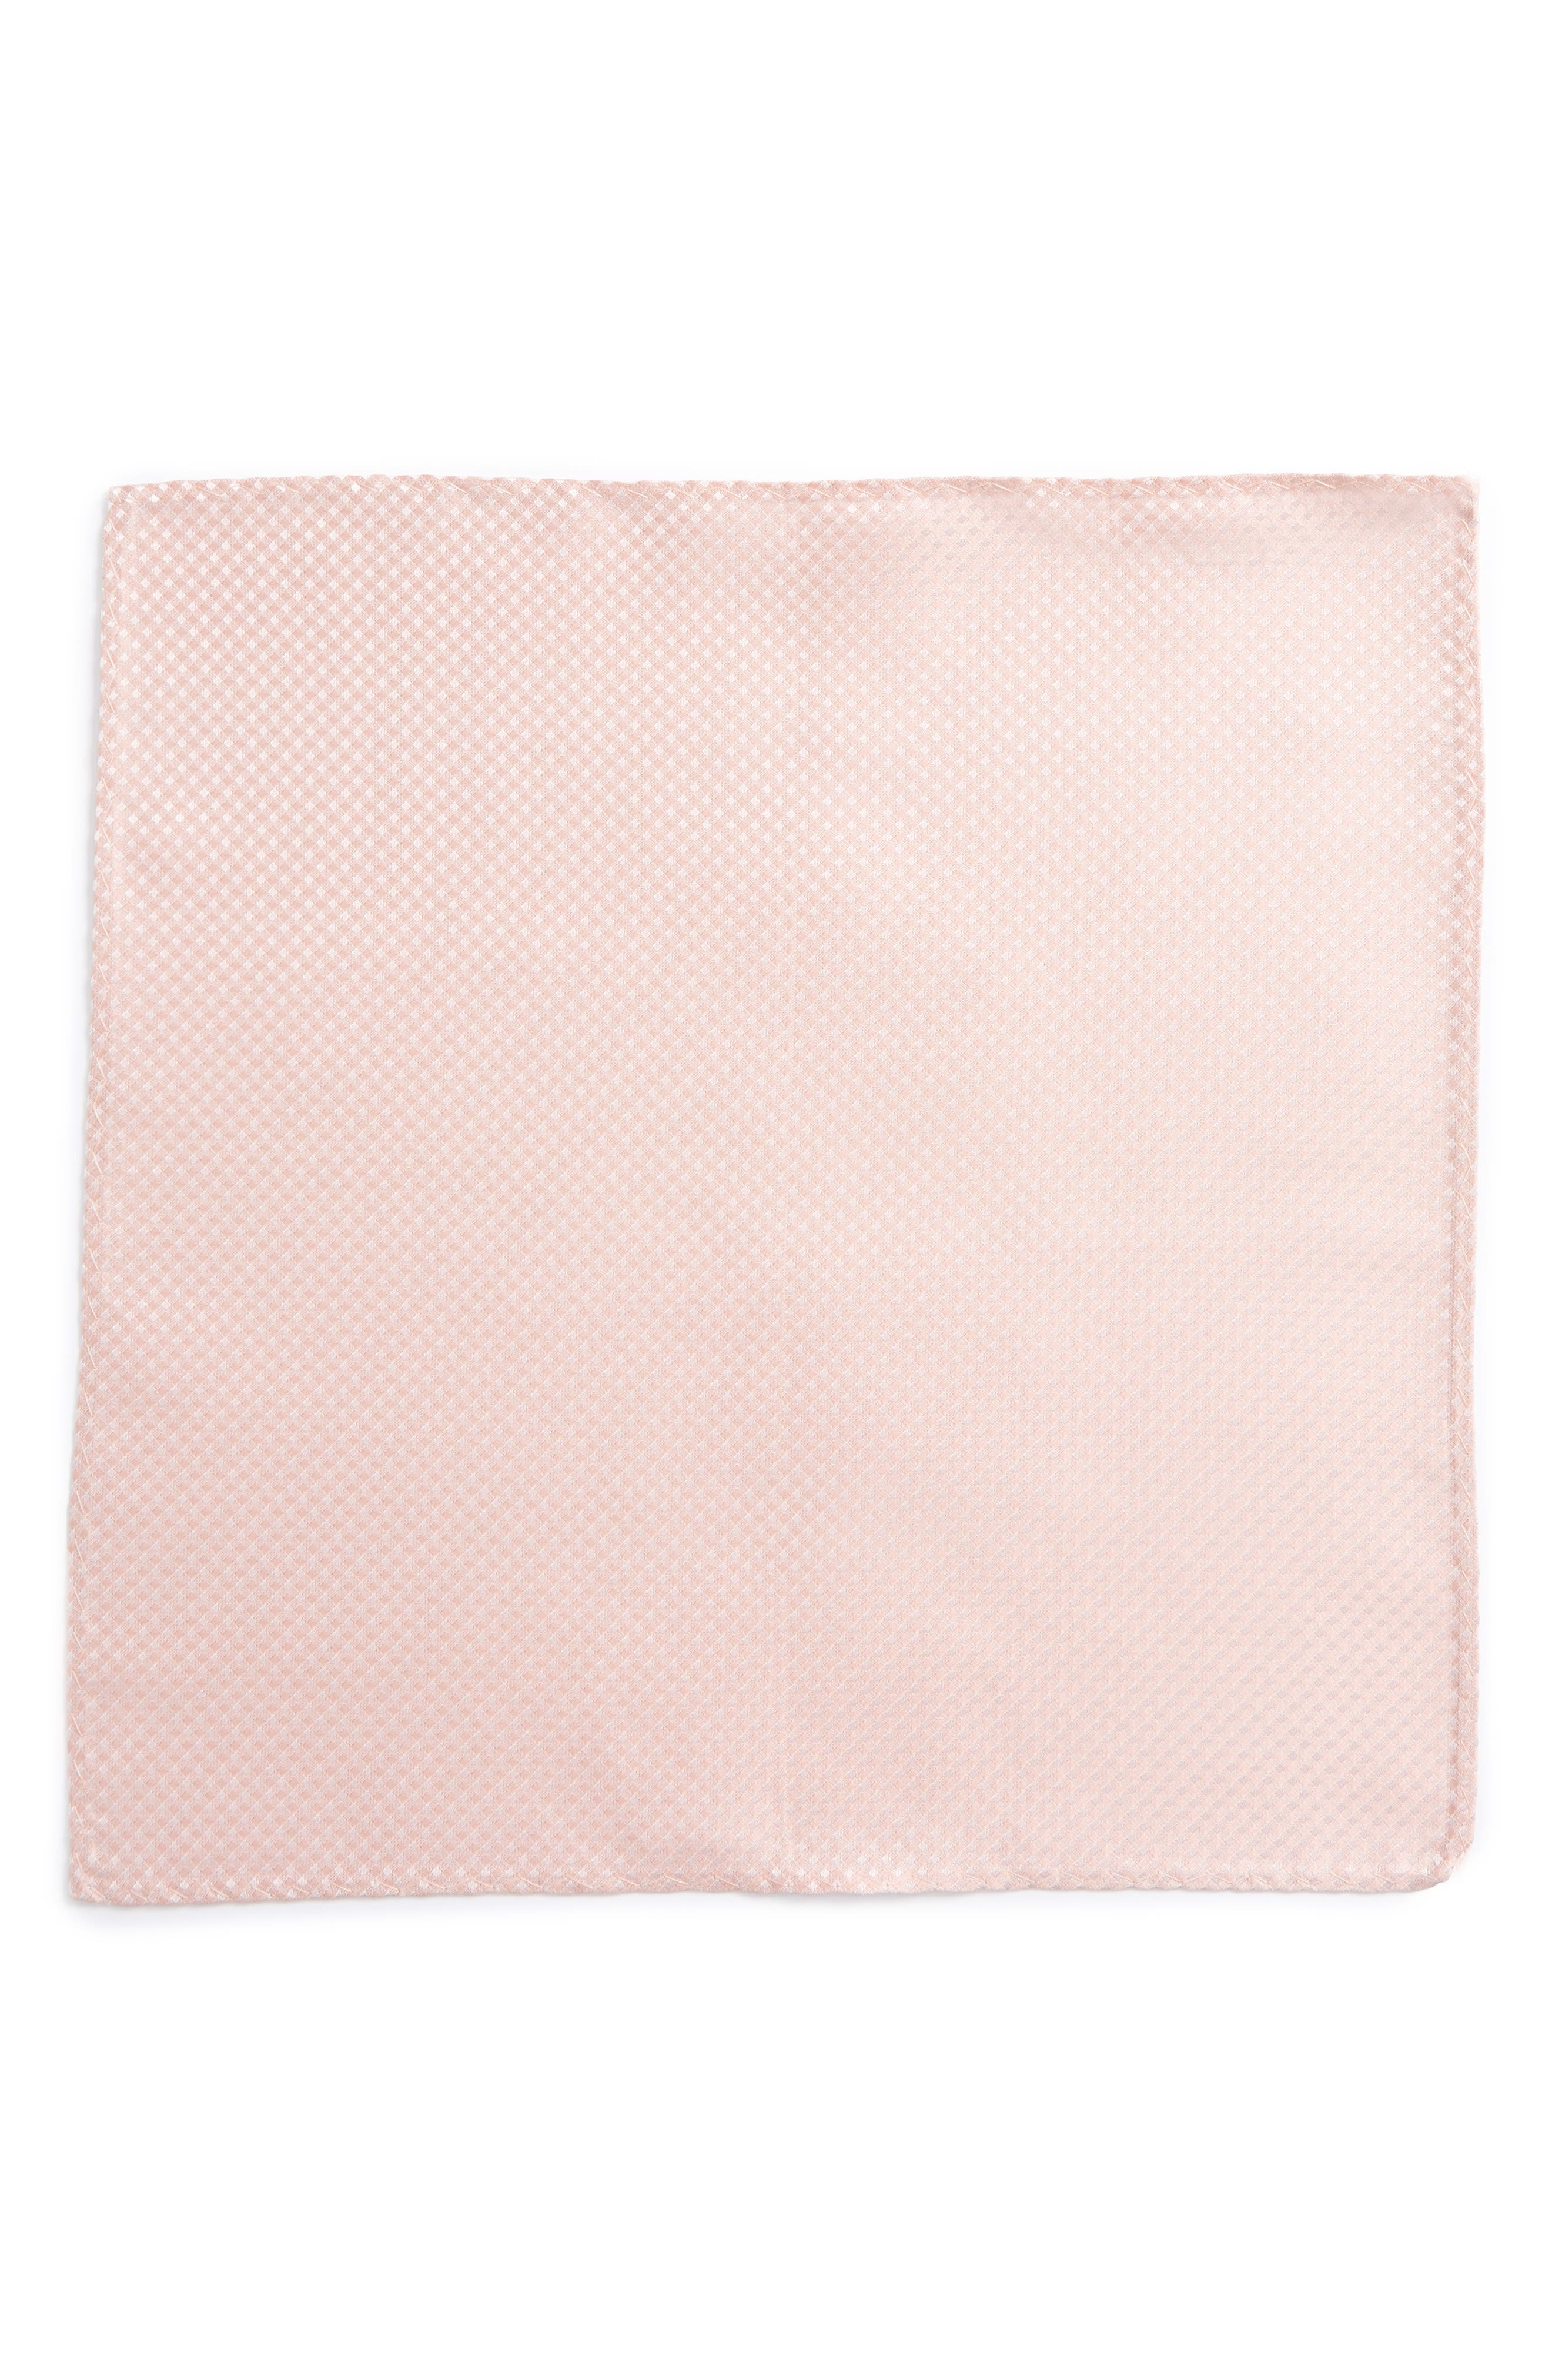 Check Silk Pocket Square,                             Alternate thumbnail 2, color,                             682